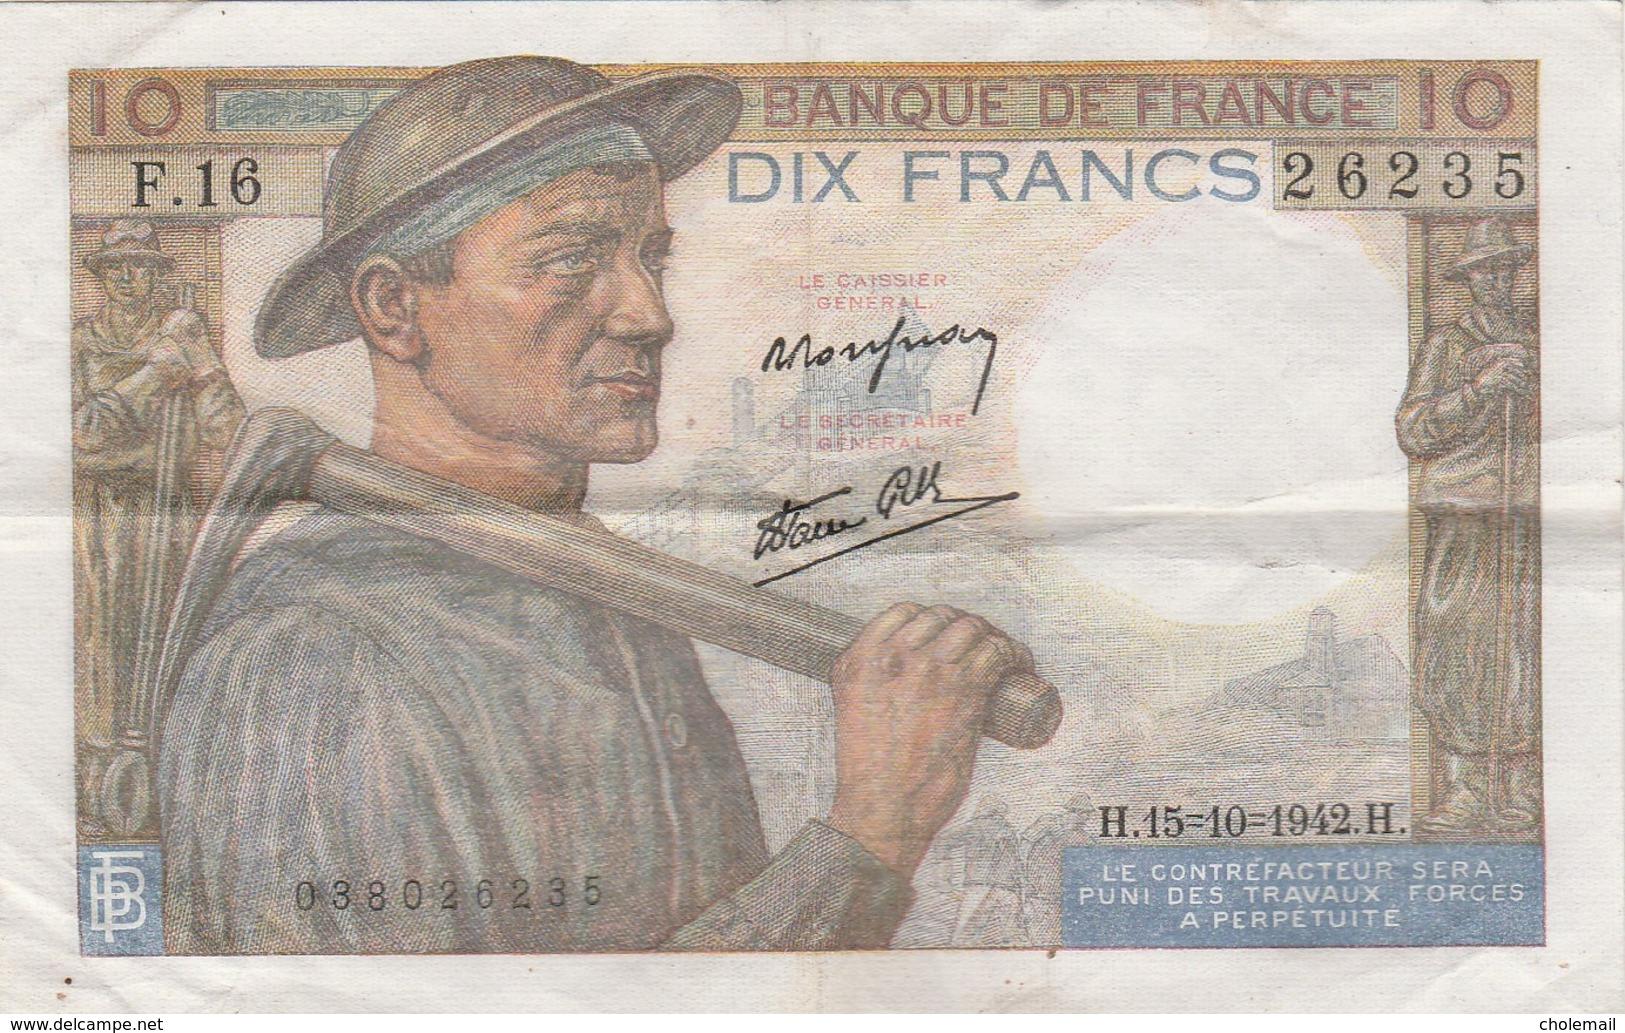 FRANCE - 10 F Mineur Du 15/10/1942 H. - 10 F 1941-1949 ''Mineur''